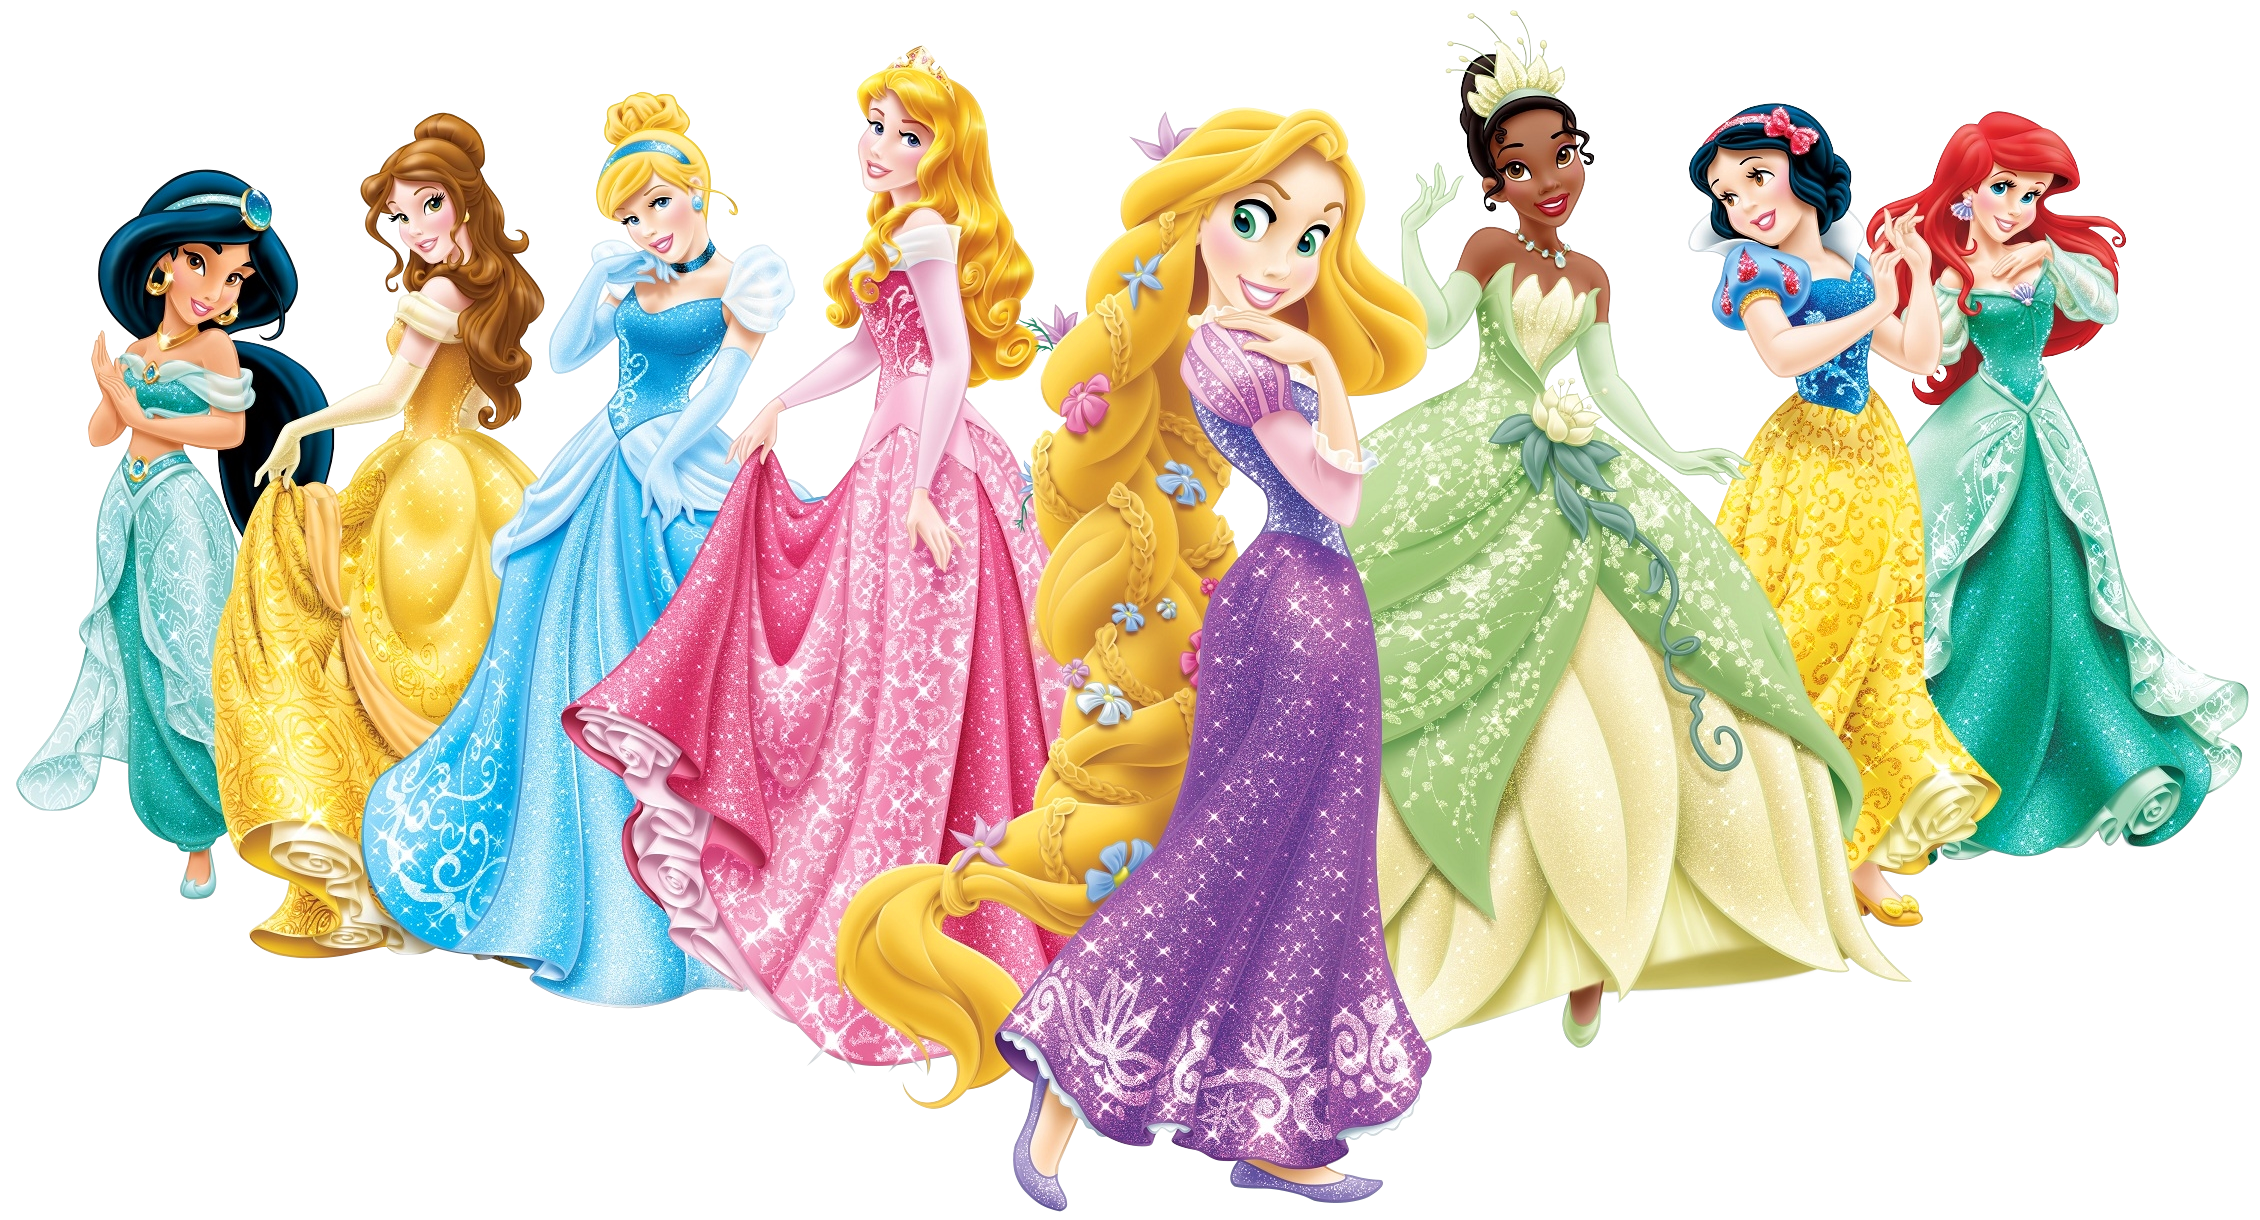 Disney Princesses PNG Cartoon Image.